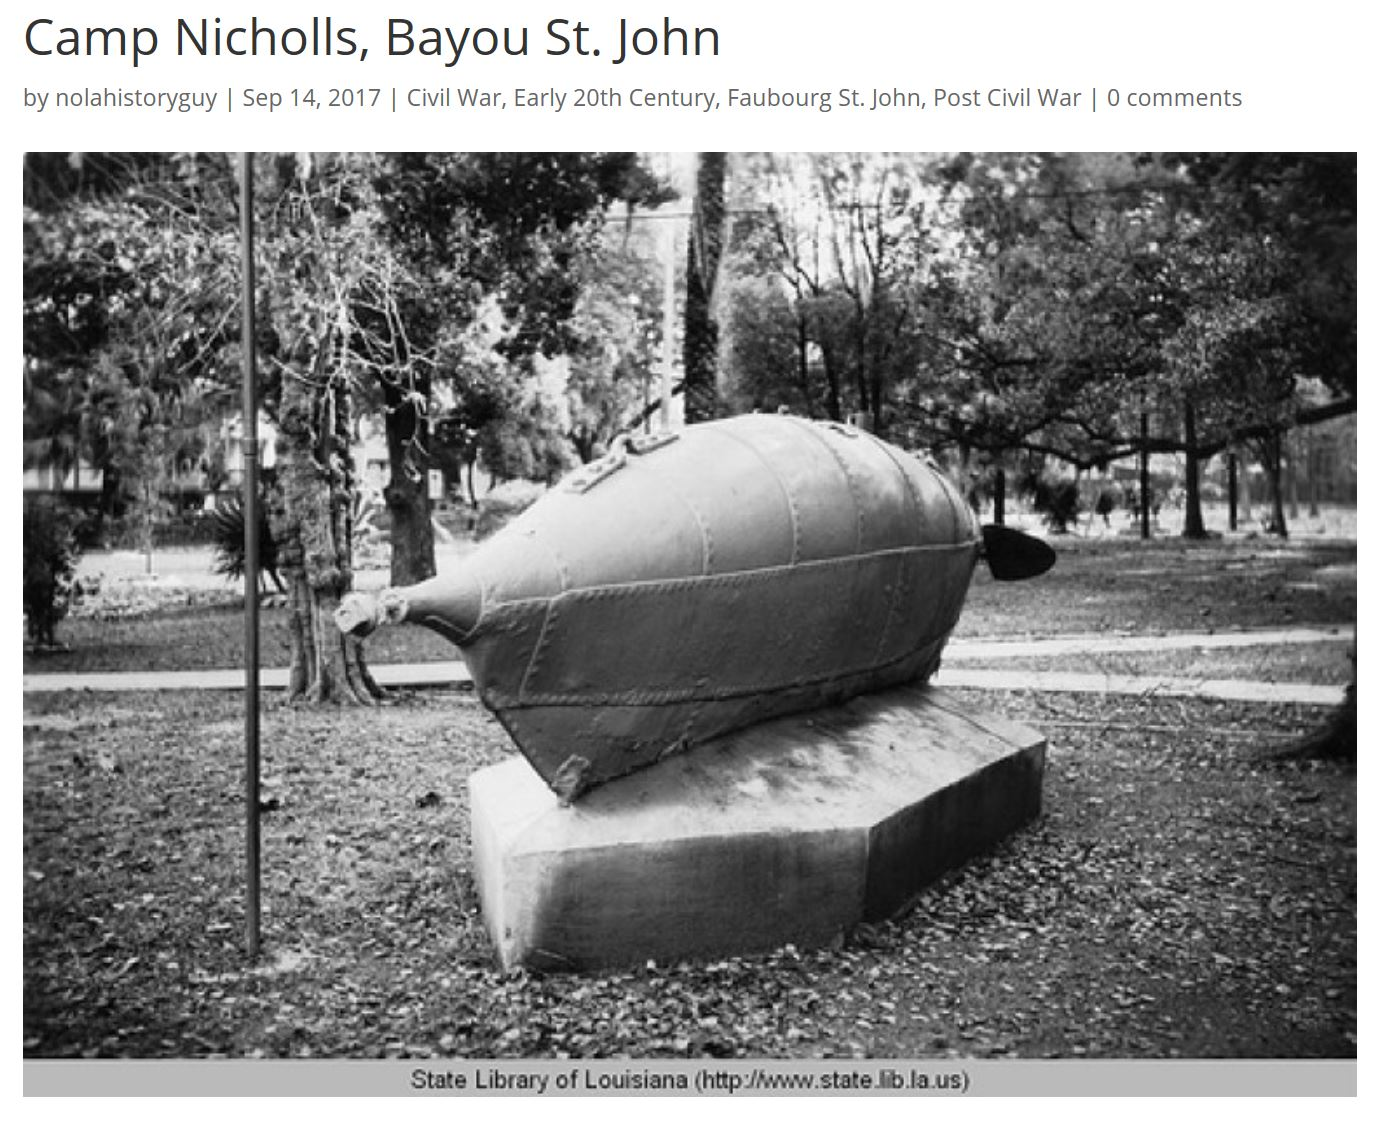 camp nicholls submarine 1907